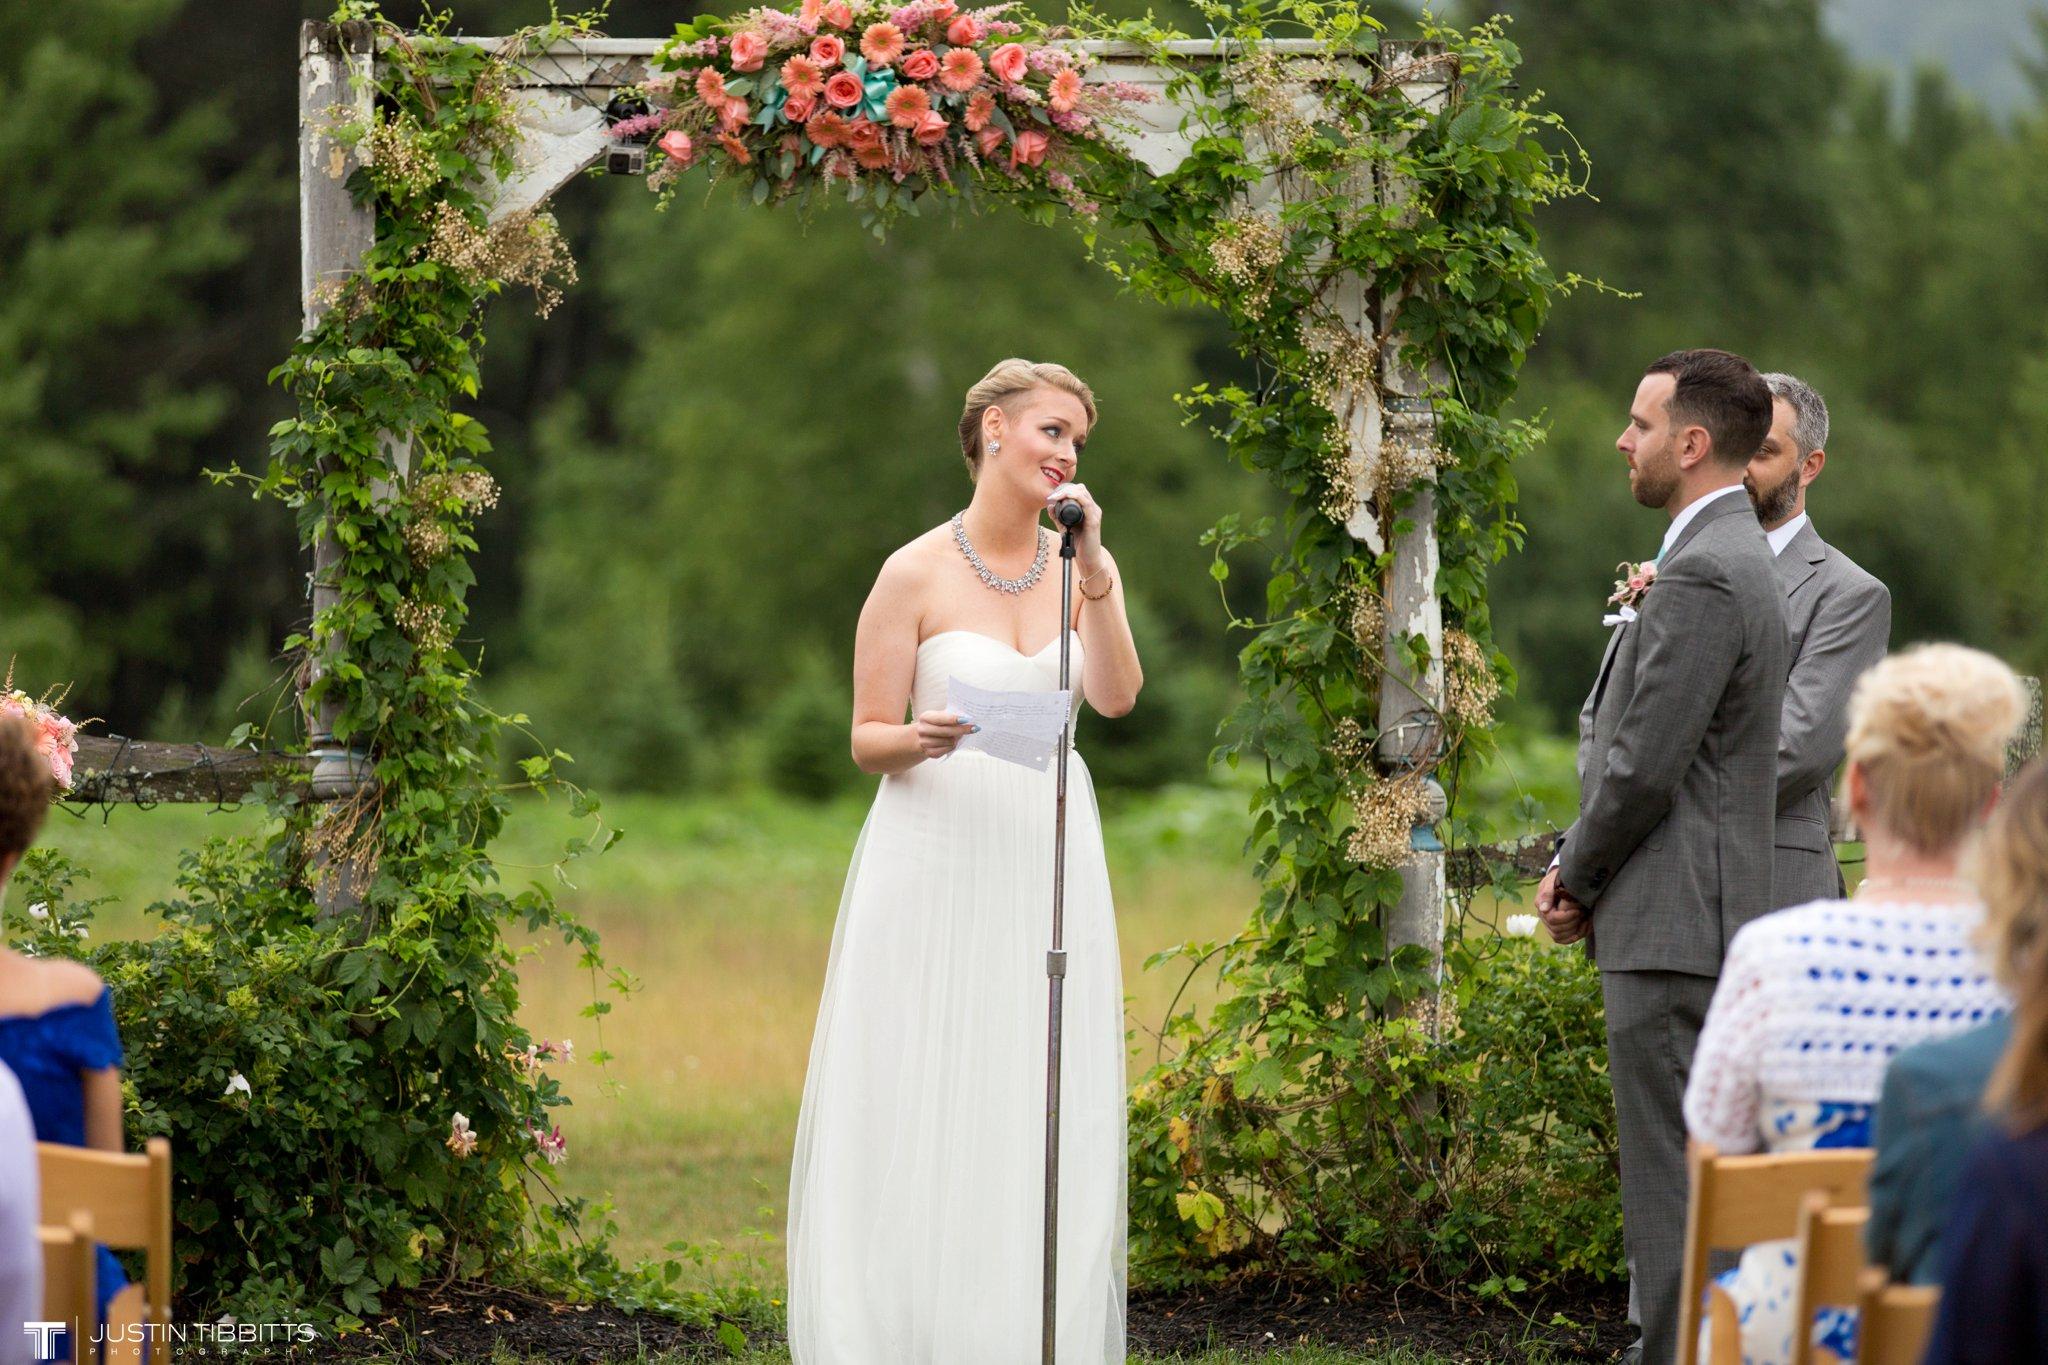 burlap-and-beams-wedding-photos-with-joran-and-molly_0066